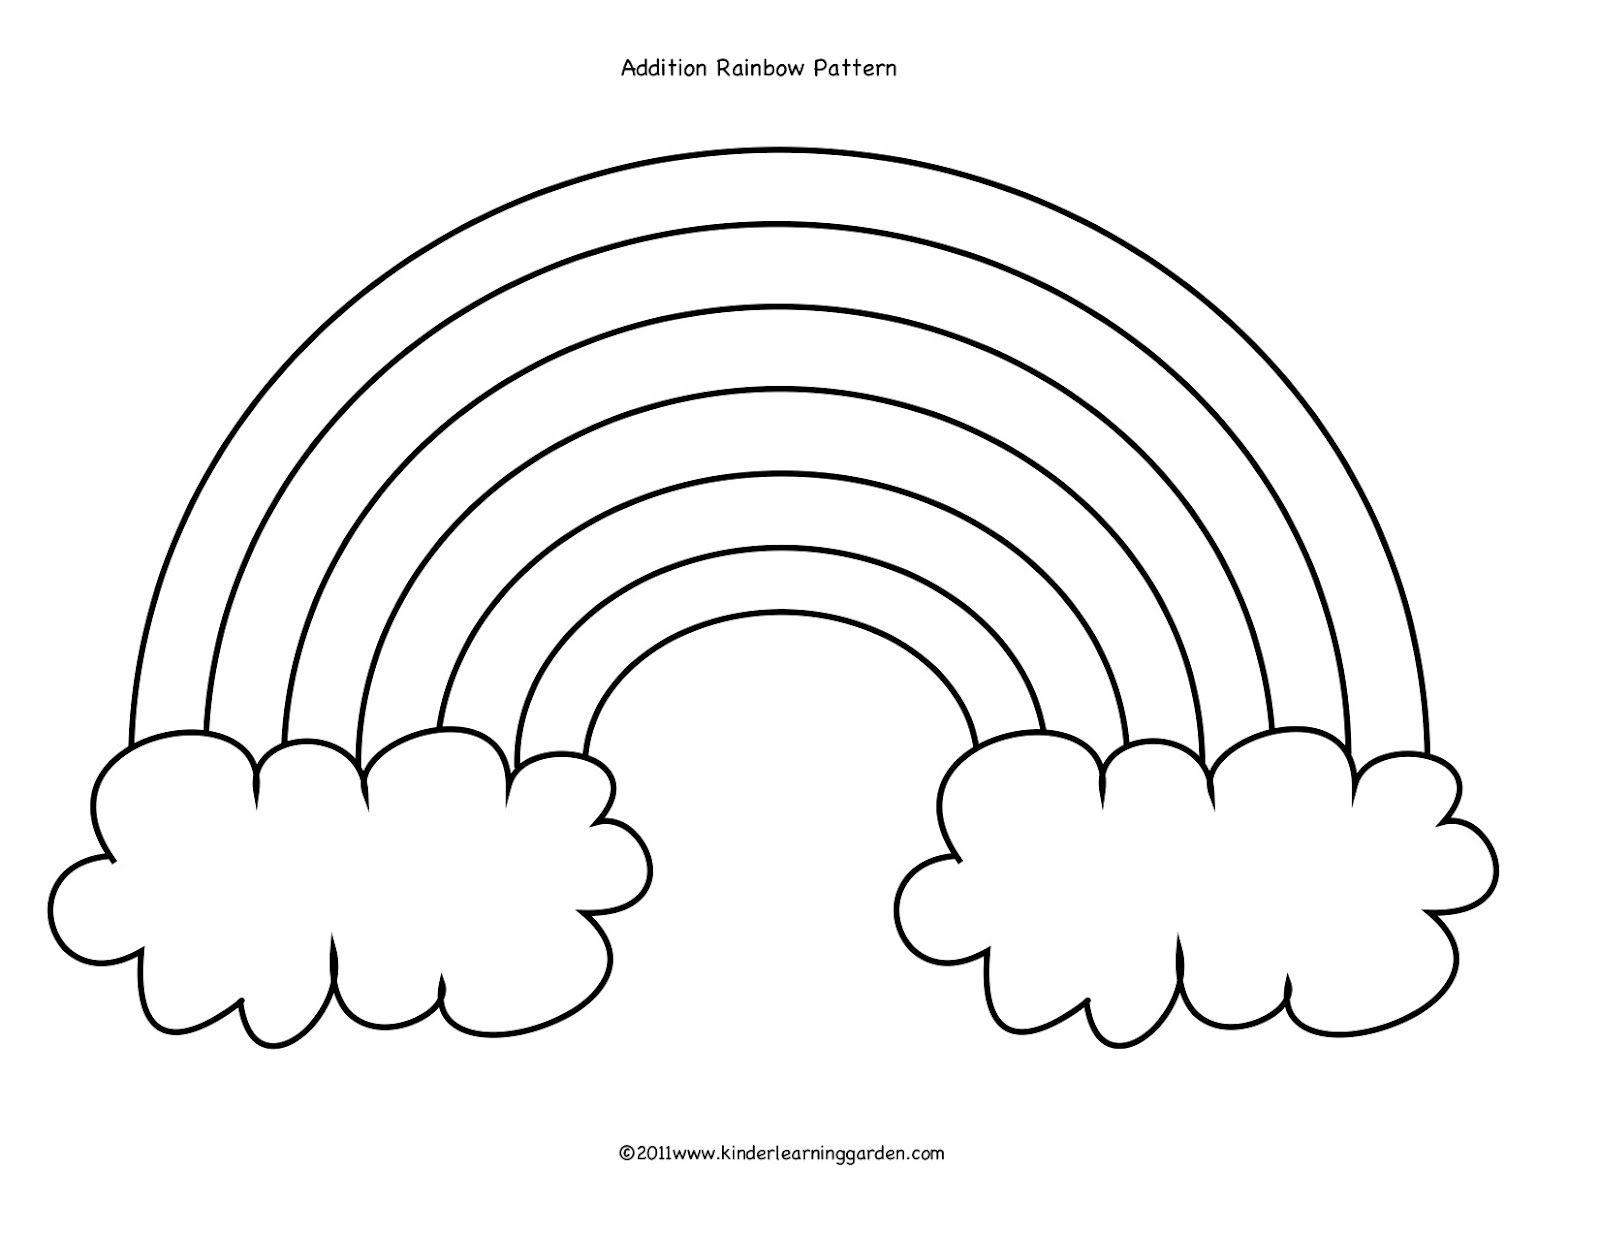 Rainbow Noah S Ark Promises Coloring Page Rainbow Pages Rainbow Drawing Preschool Coloring Pages [ 1236 x 1600 Pixel ]